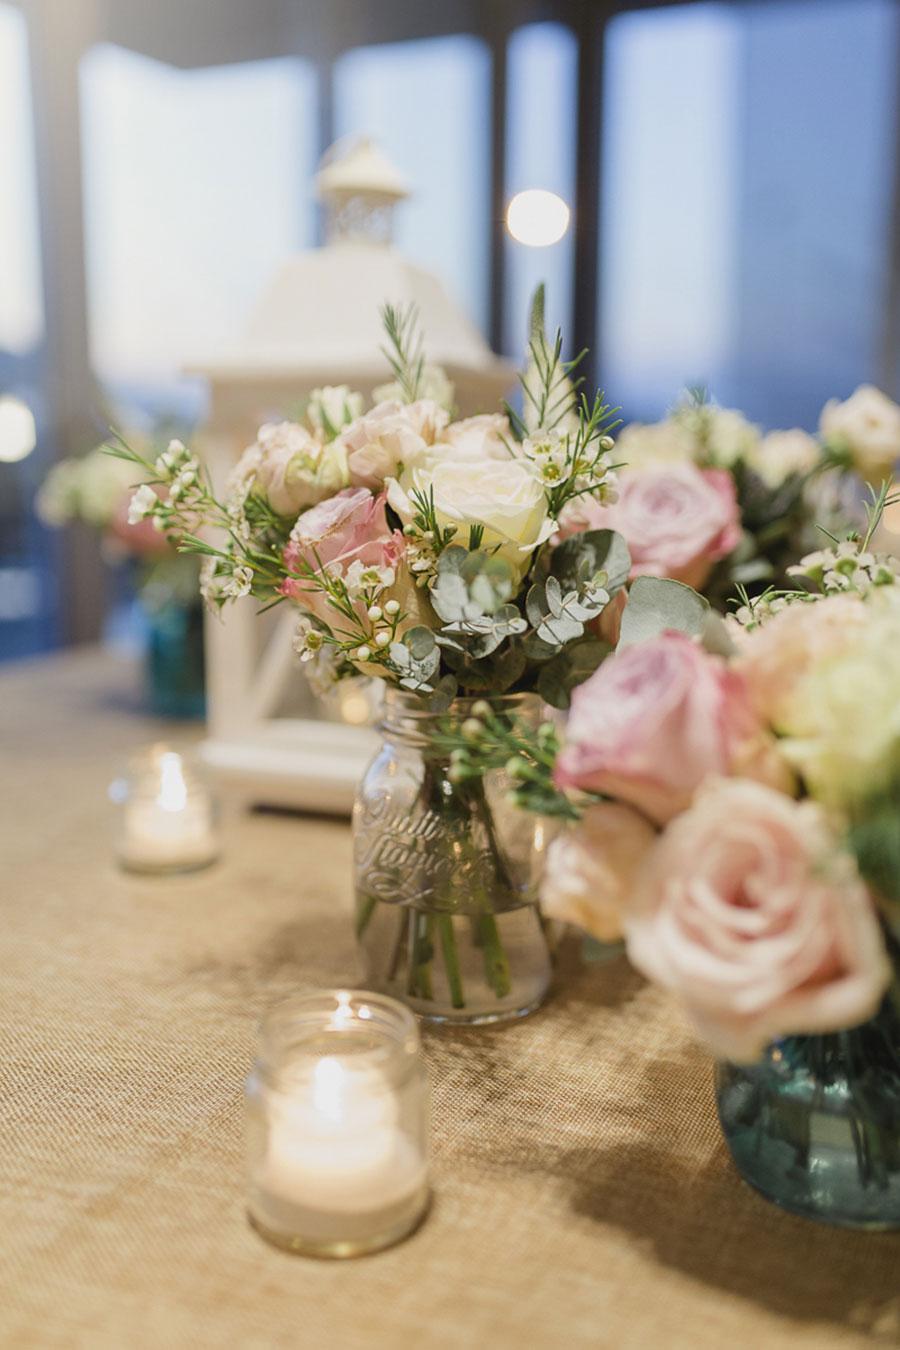 Wedding-Nicholad-and-Federica-Giuseppe-Giovannelli-34